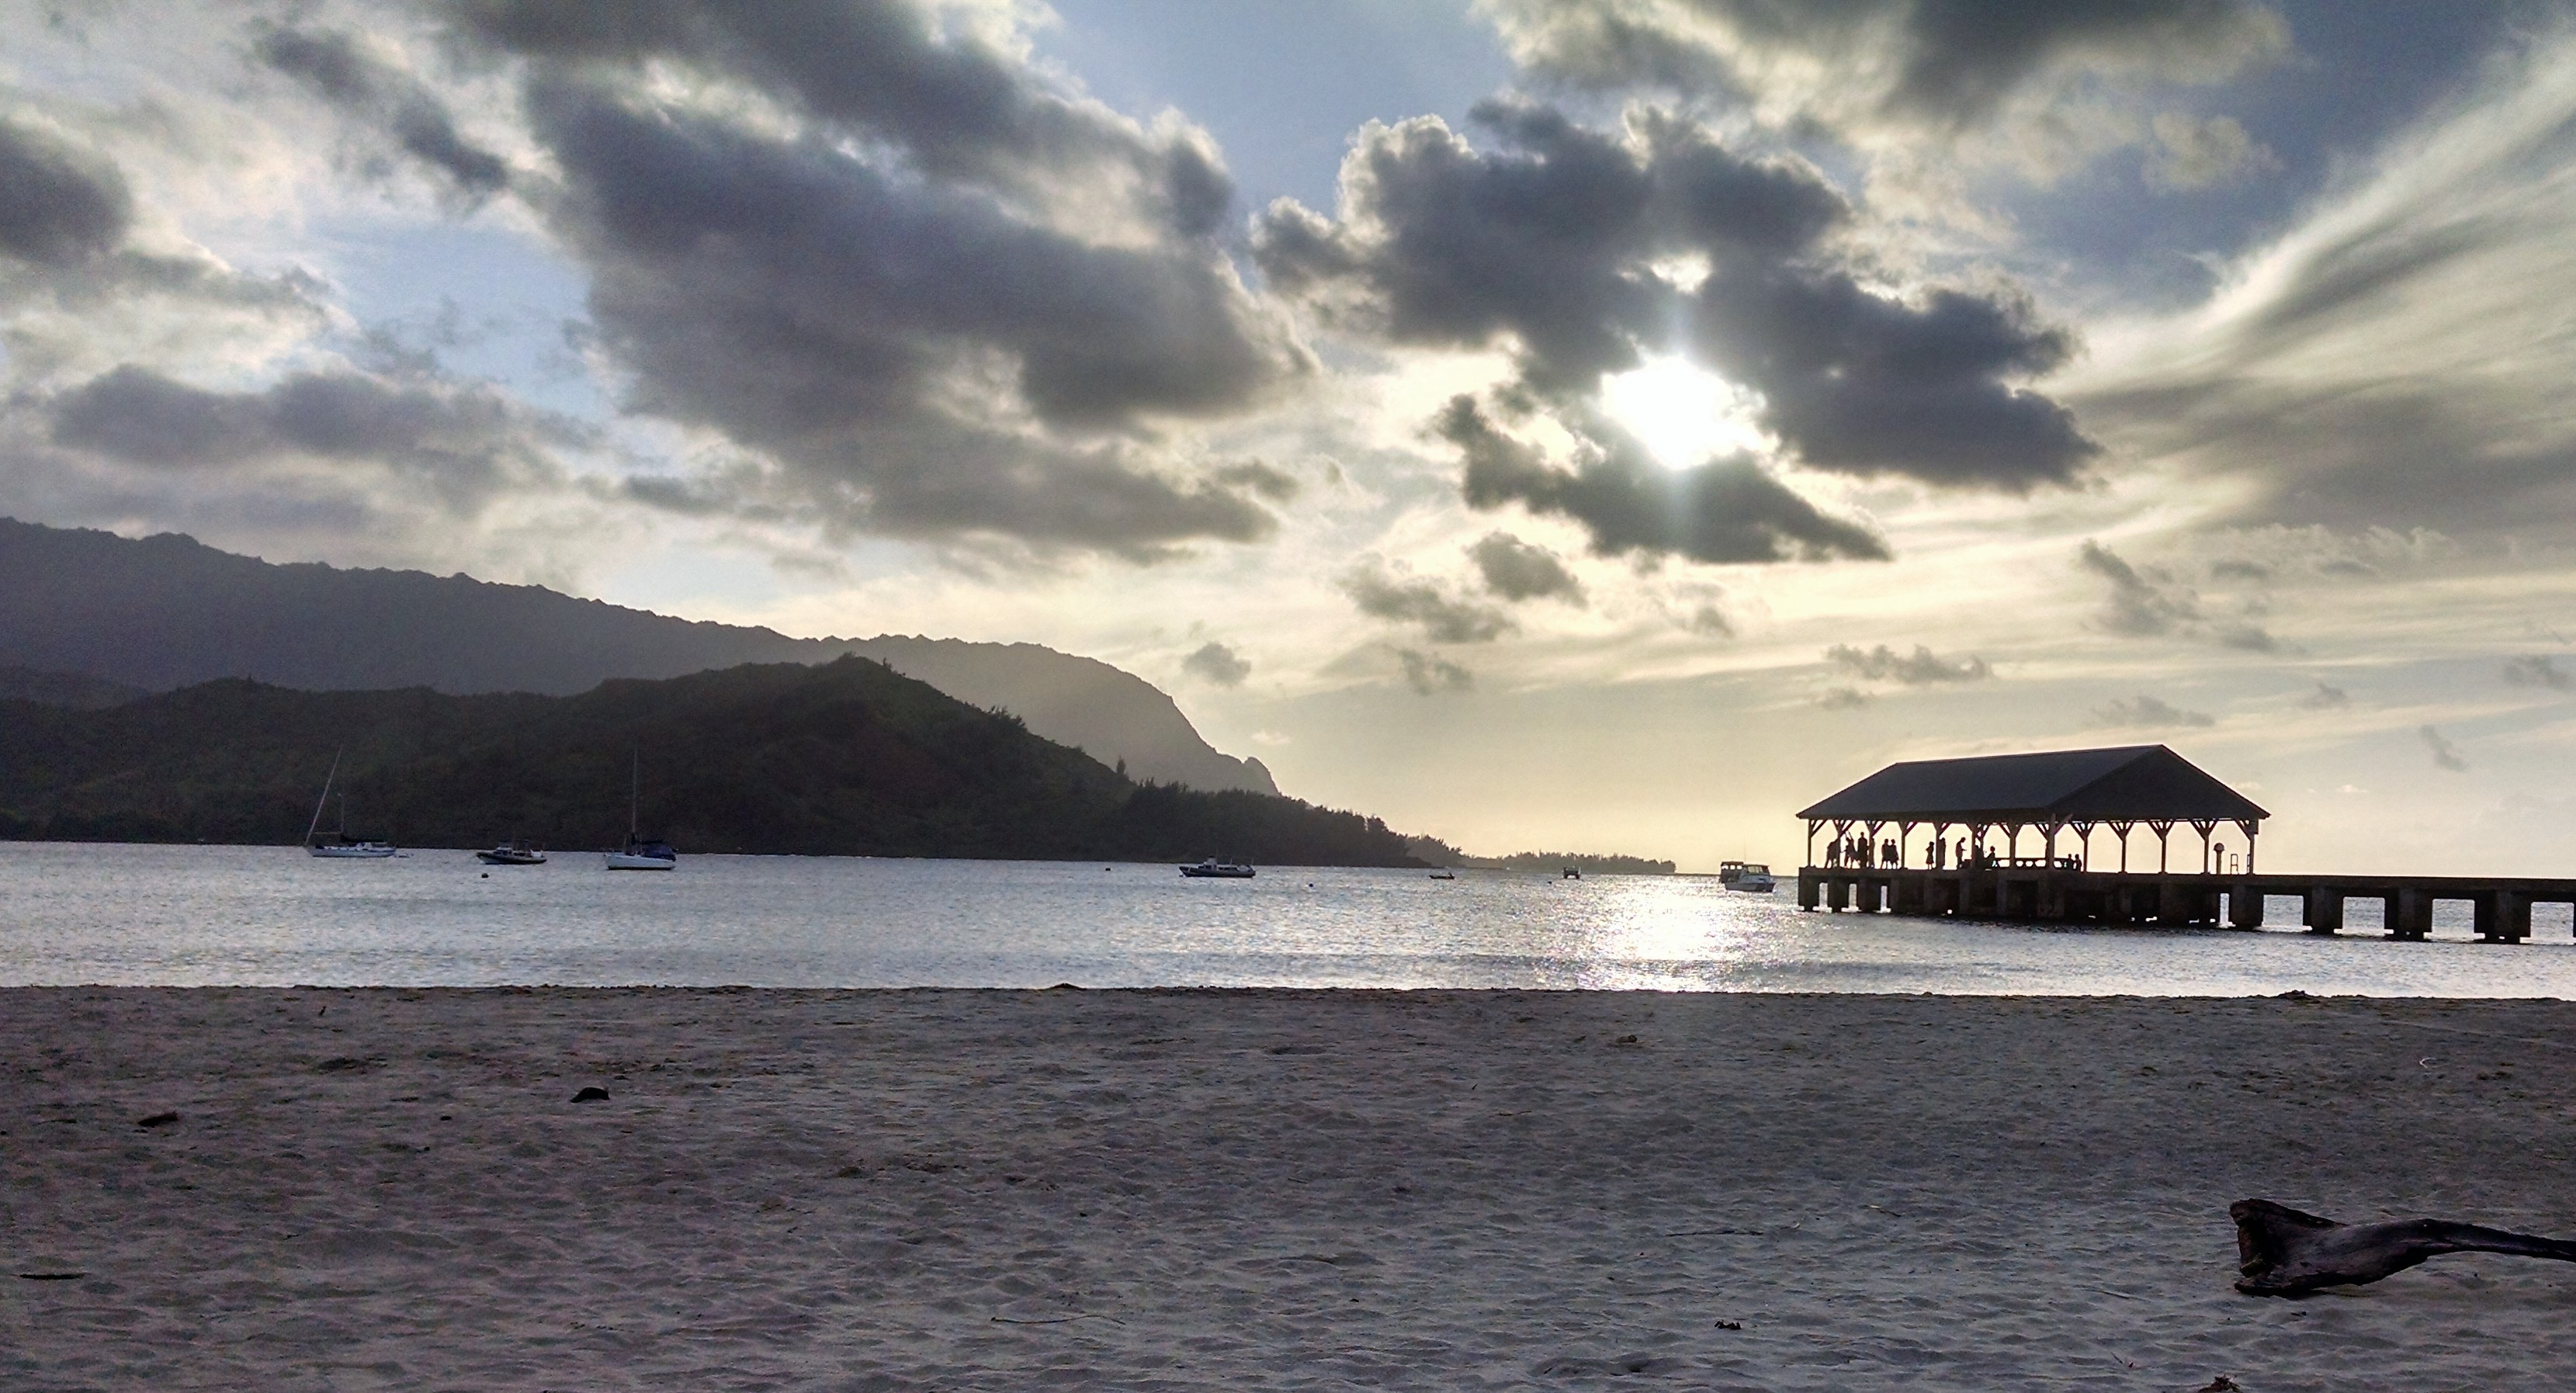 Hanalei Bay/Napali Coast sunset